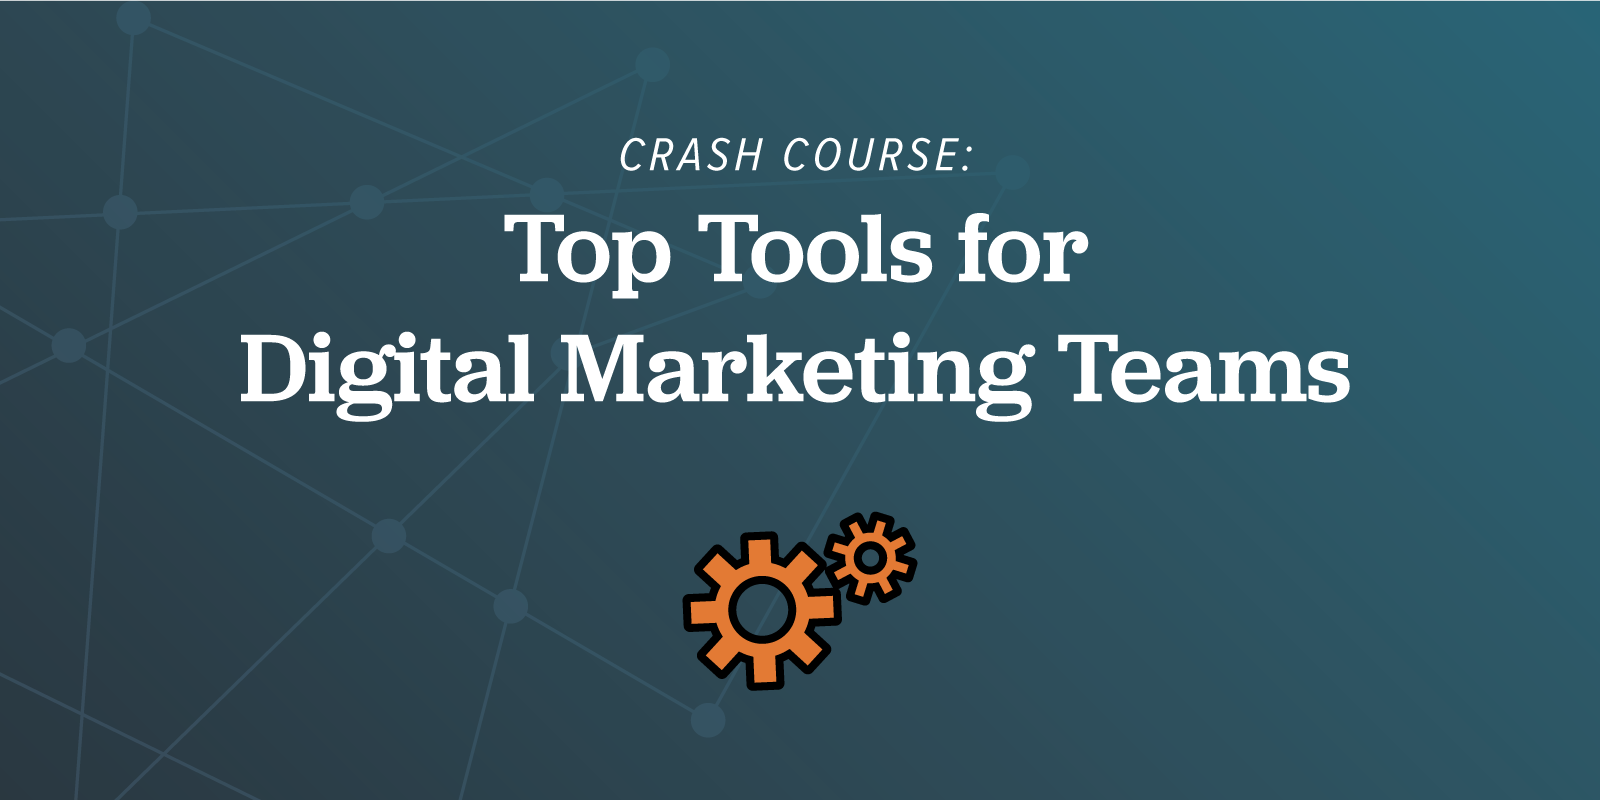 ArcStone Crash Course: Top Tools for Digital Marketing Teams